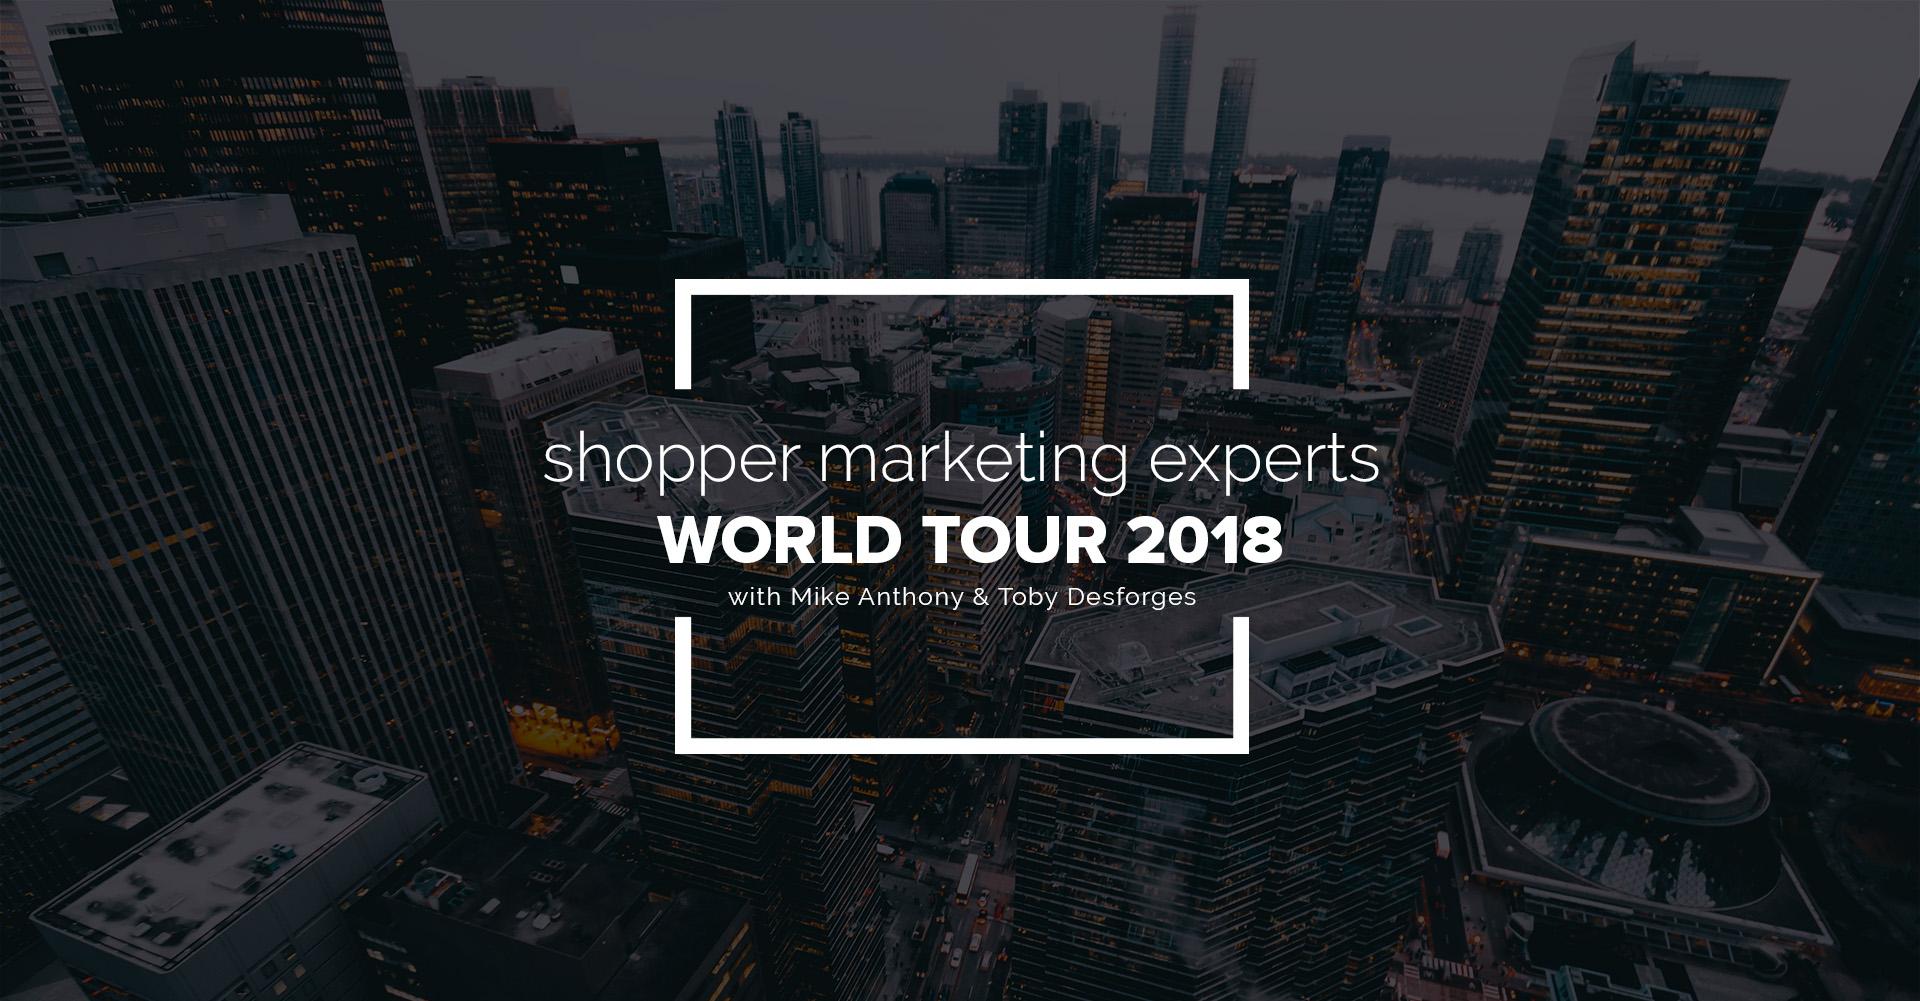 Shopper Marketing Experts World Tour 2018